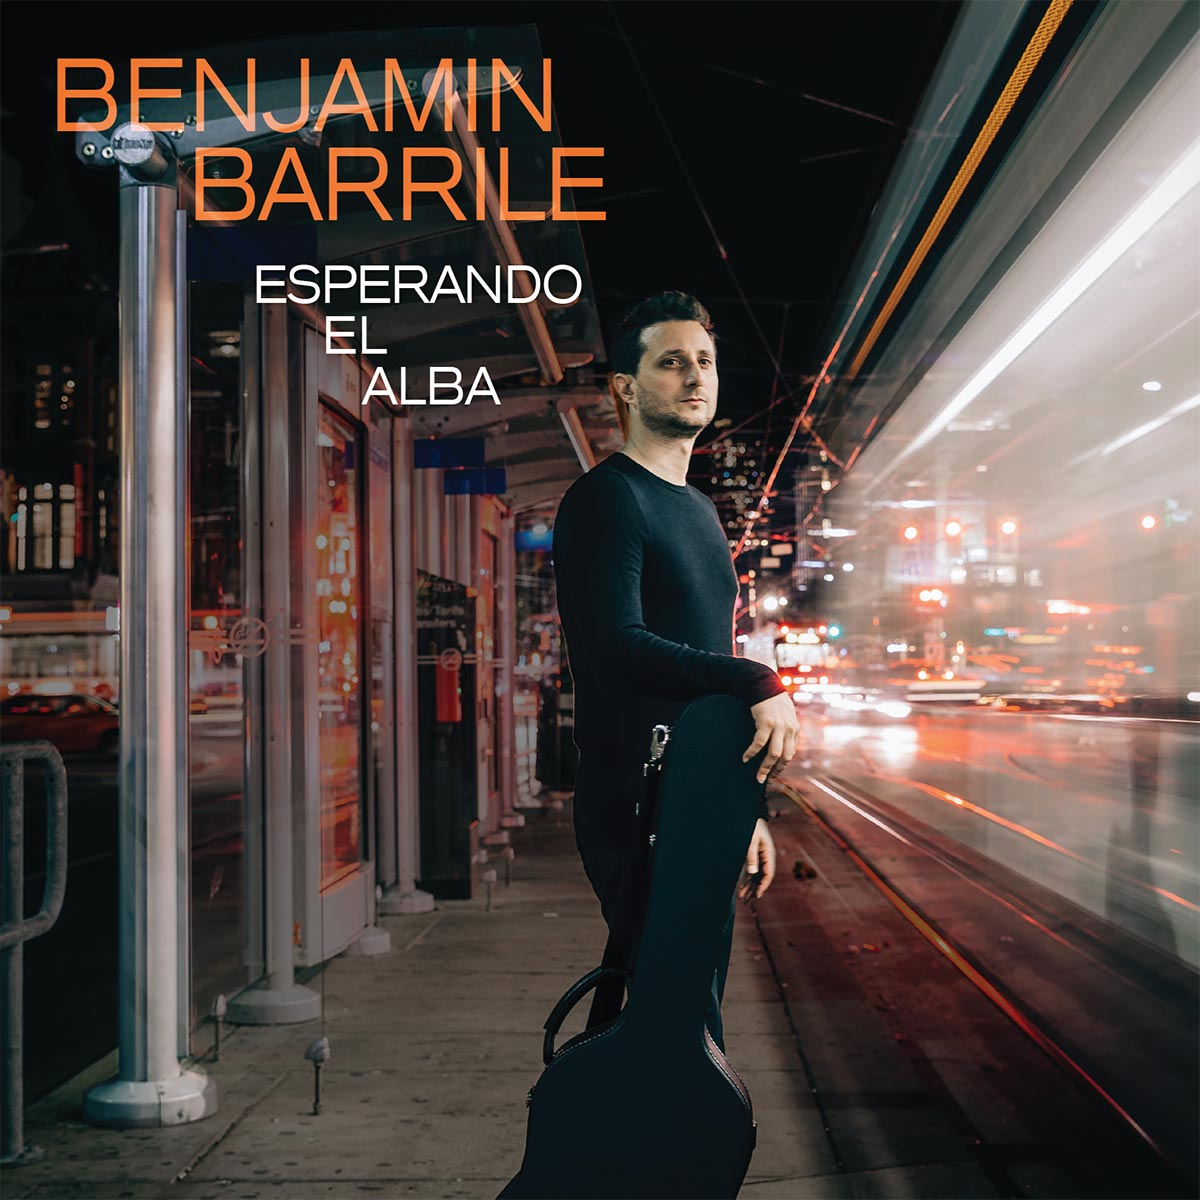 Benjamin Barrile - Esperando El Alba - Album art